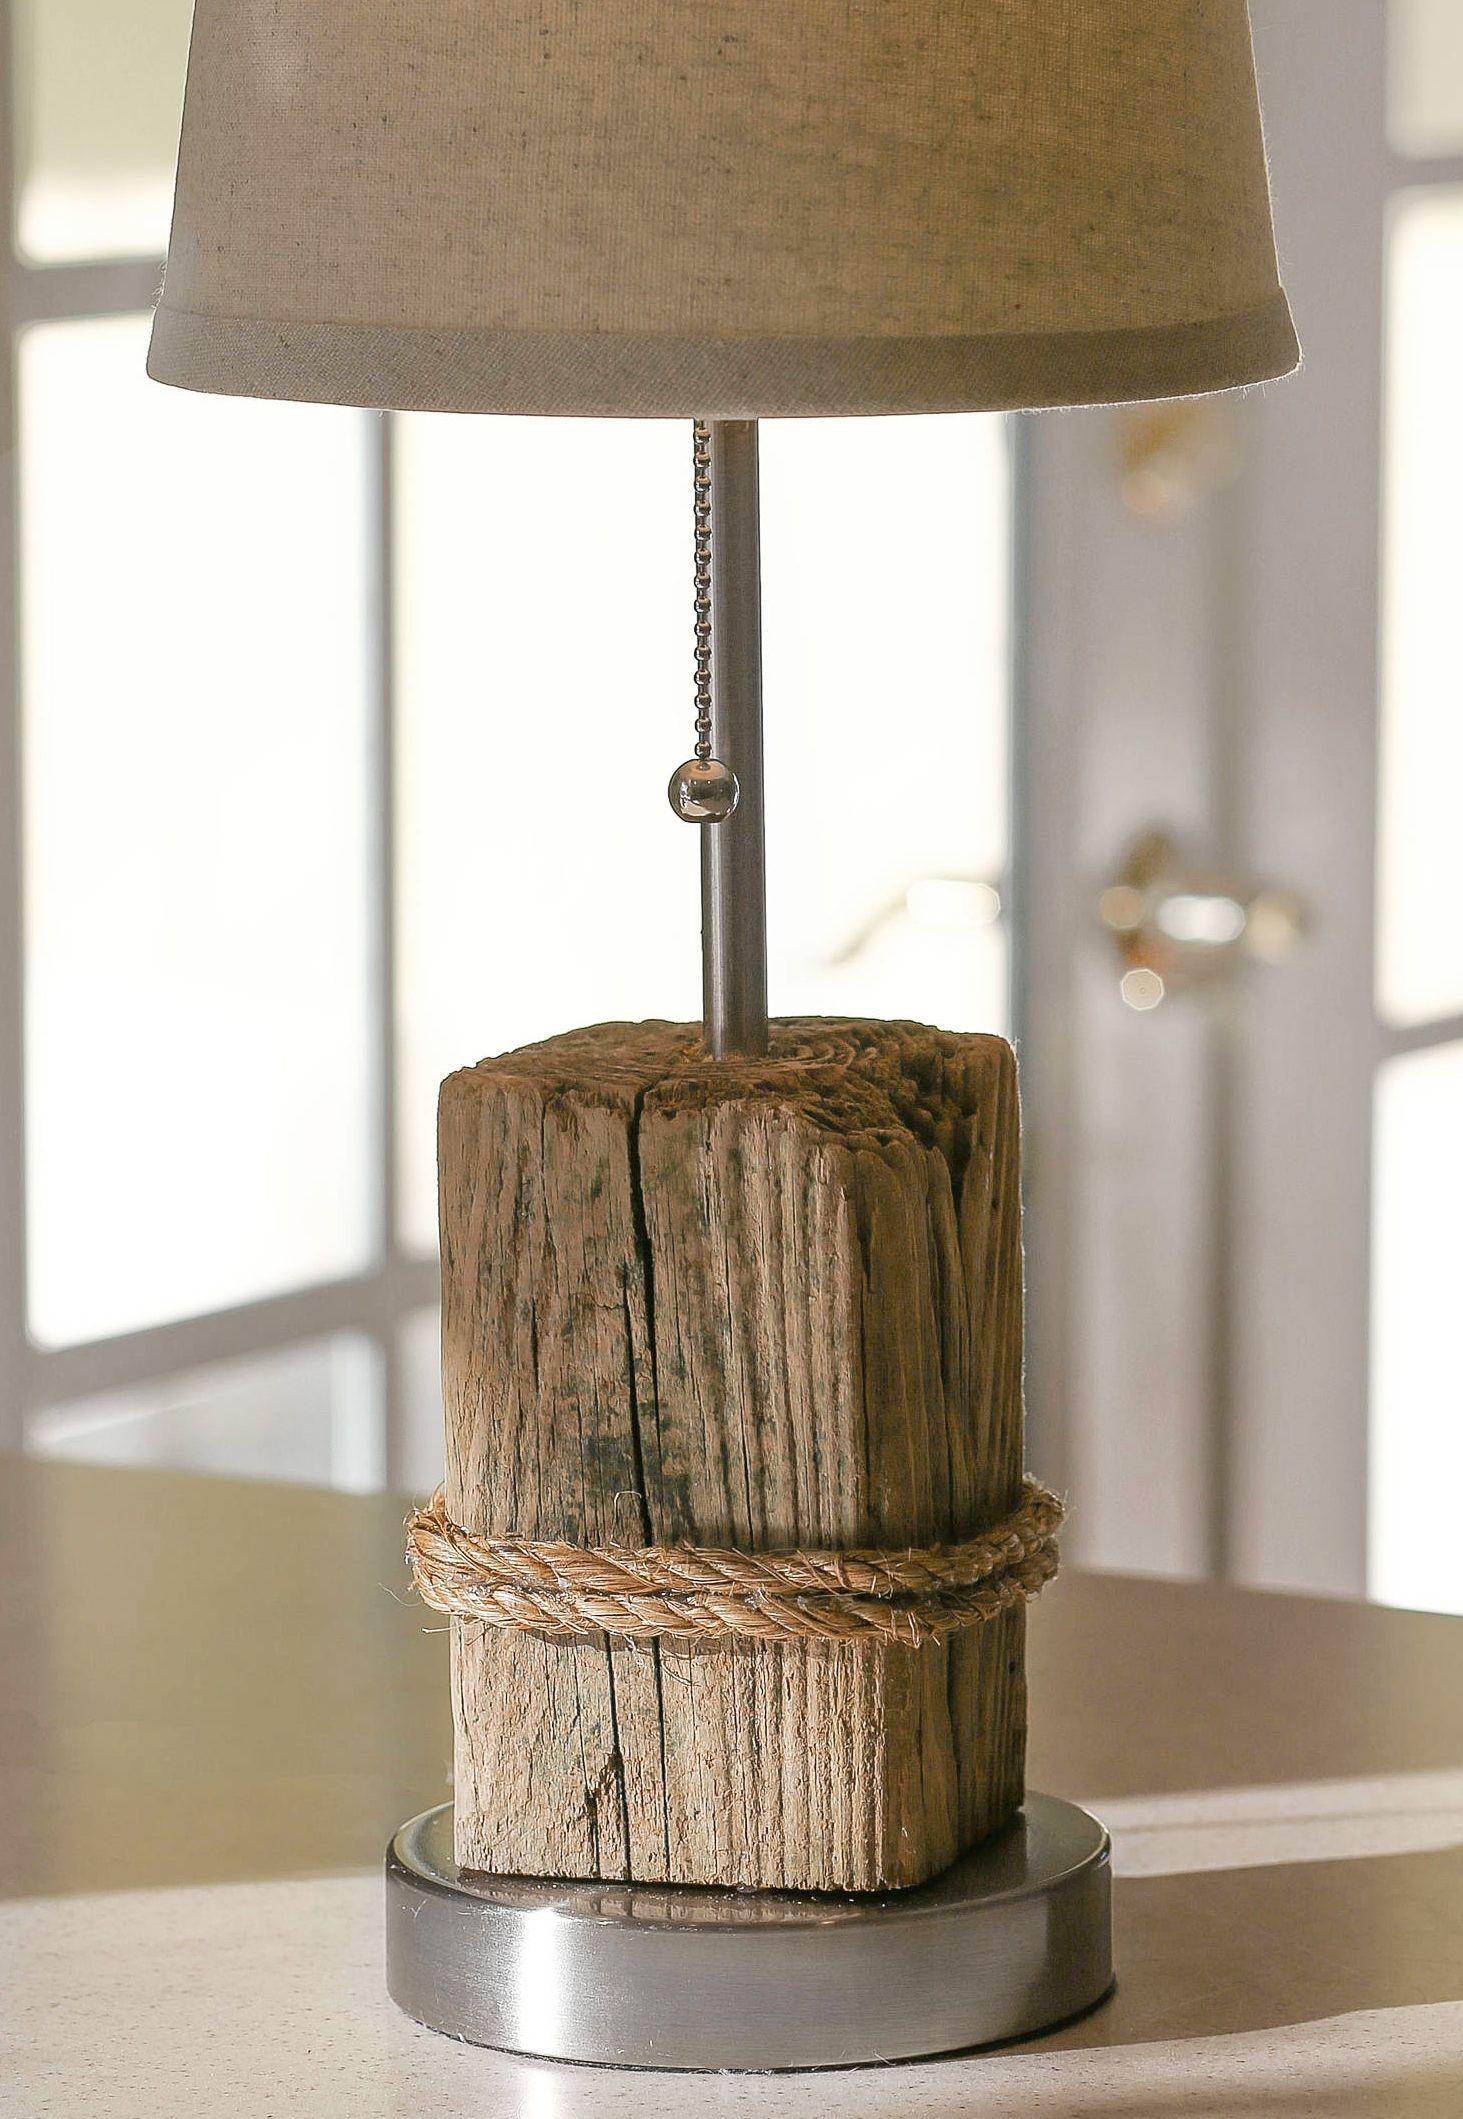 Driftwood Table Lamp Driftwood Lamps Coastal Style Furniture Coastal Style Bathroom